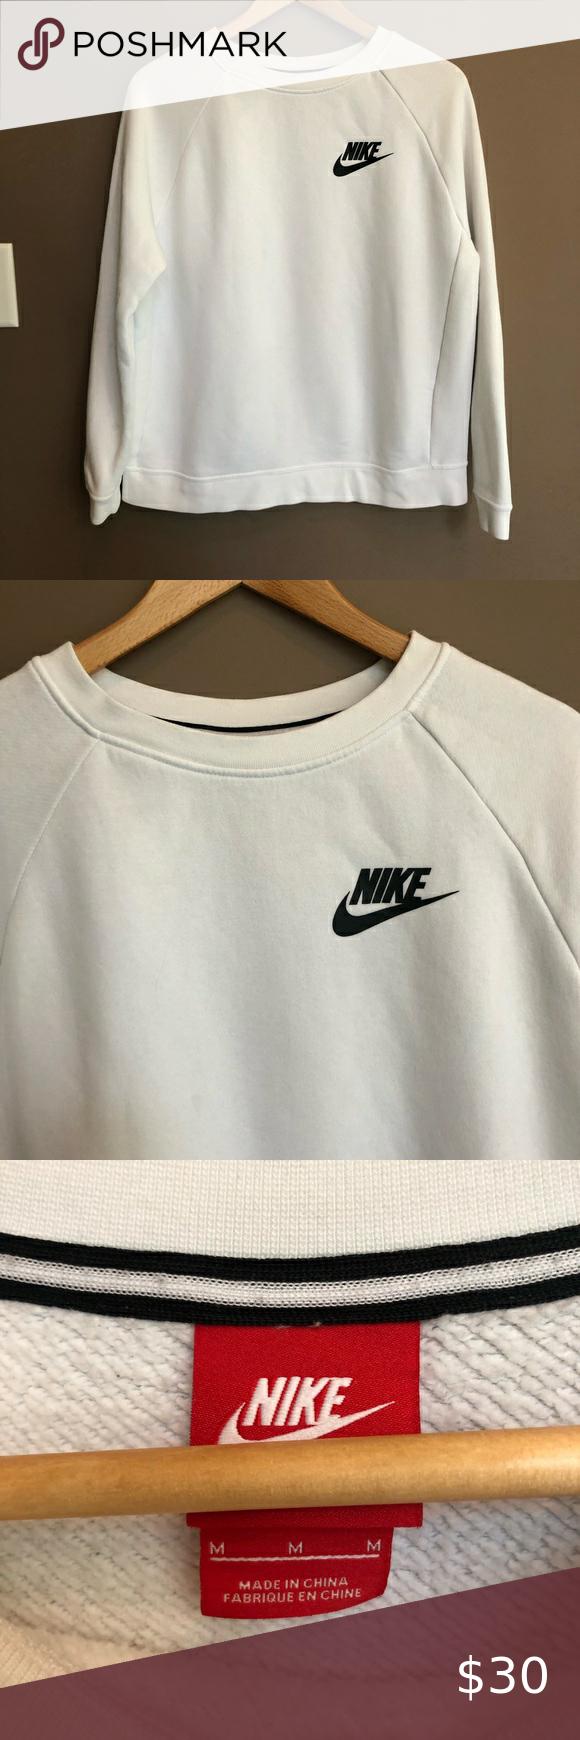 Nike Crew Neck Pull Over Sweatshirt White Medium Sweatshirts White Sweatshirt Sweatshirt Shirt [ 1740 x 580 Pixel ]